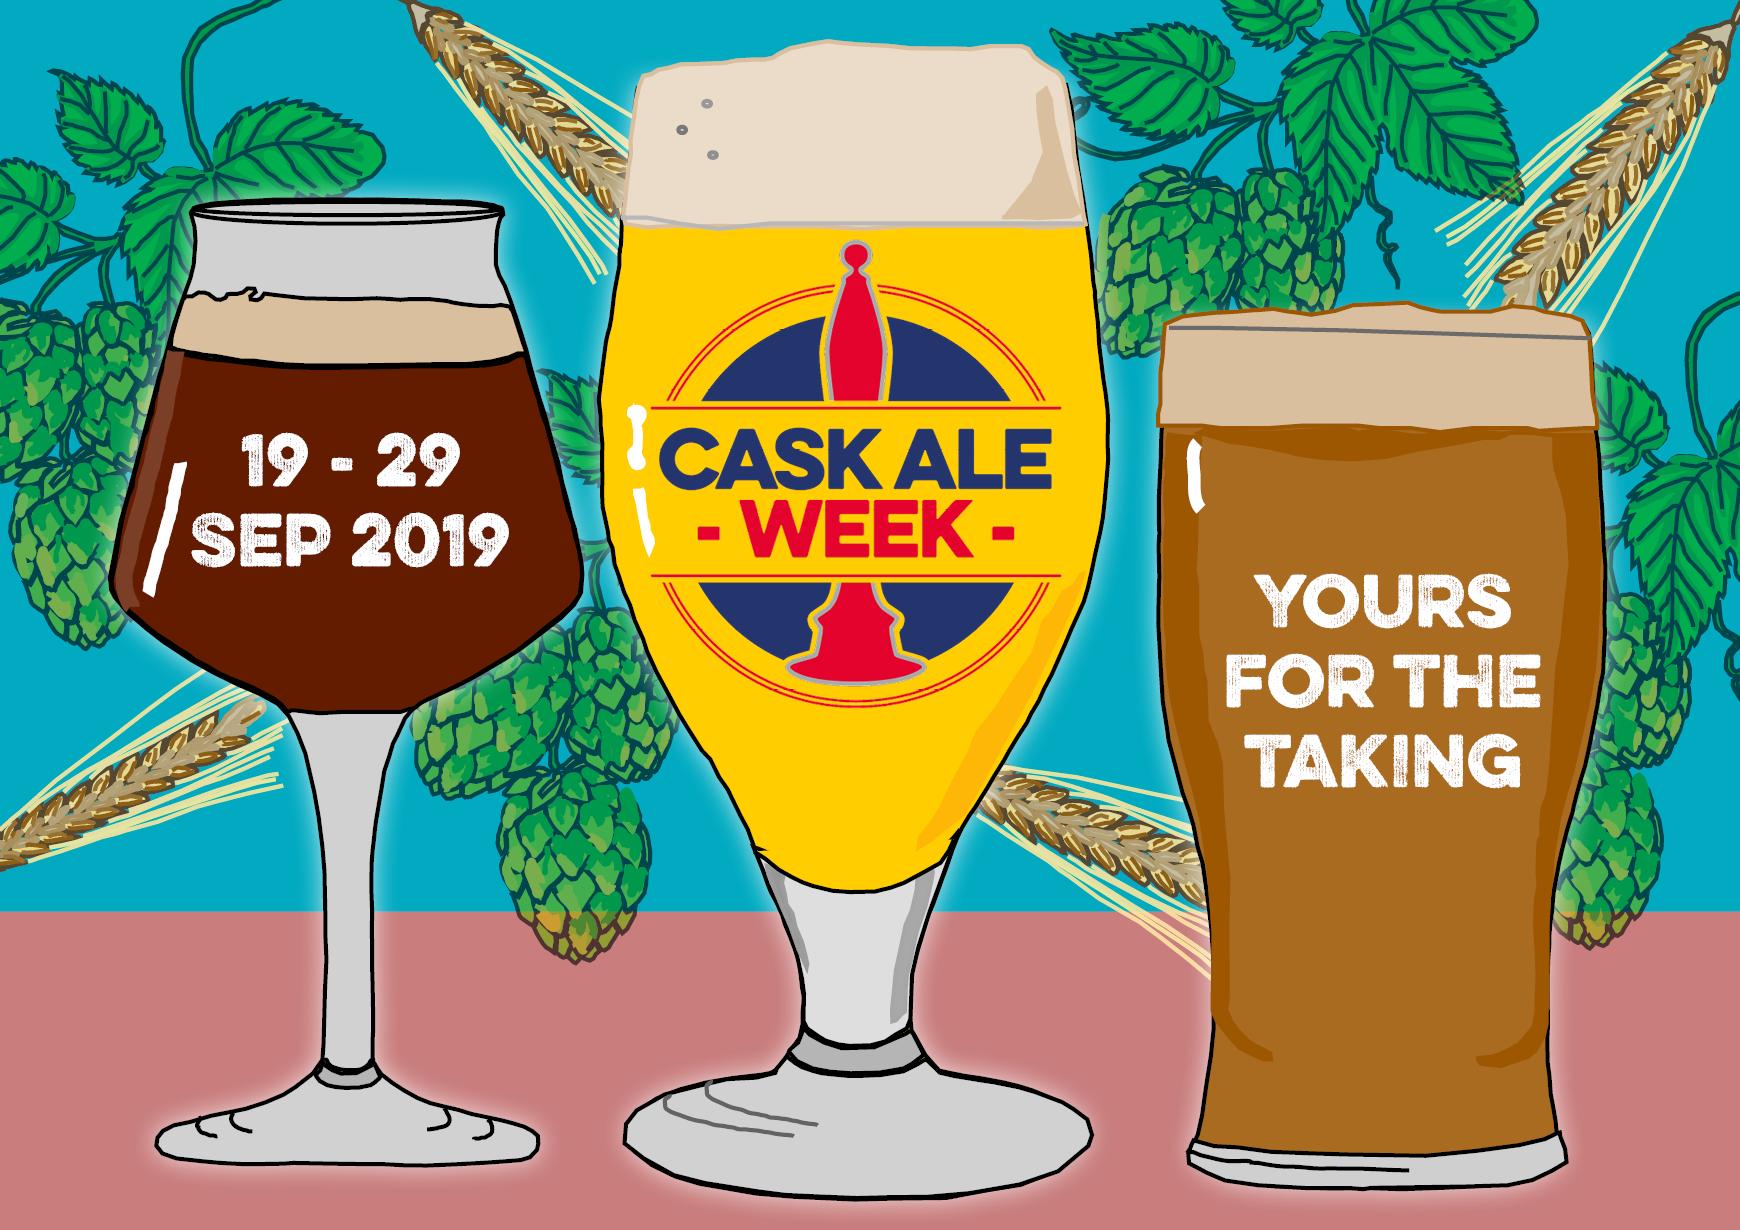 Postcard promoting Cask Ale Week 2019 (front)